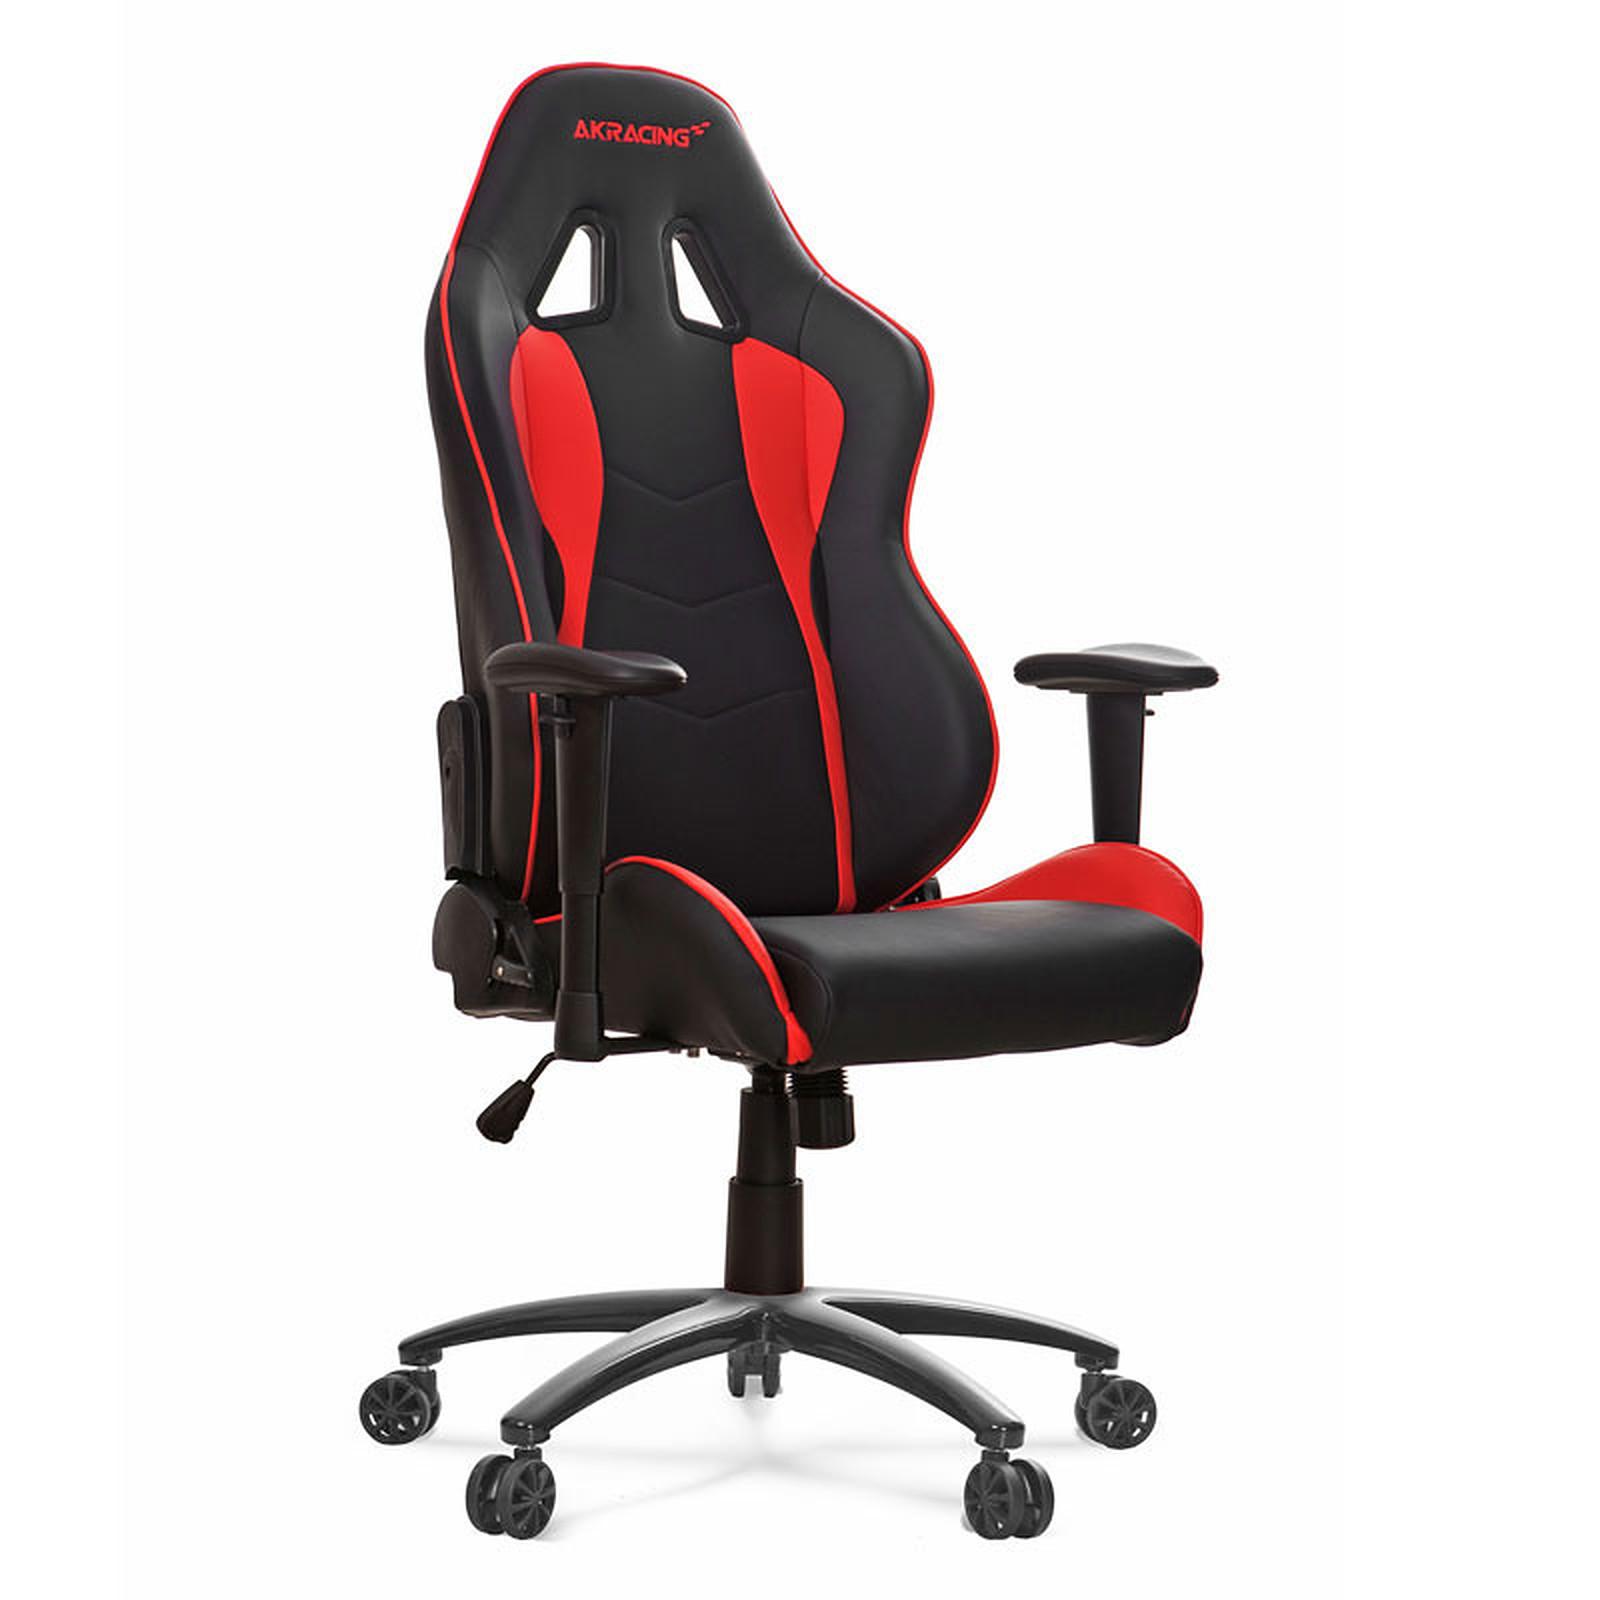 AKRacing Nitro Gaming Chair (rouge)